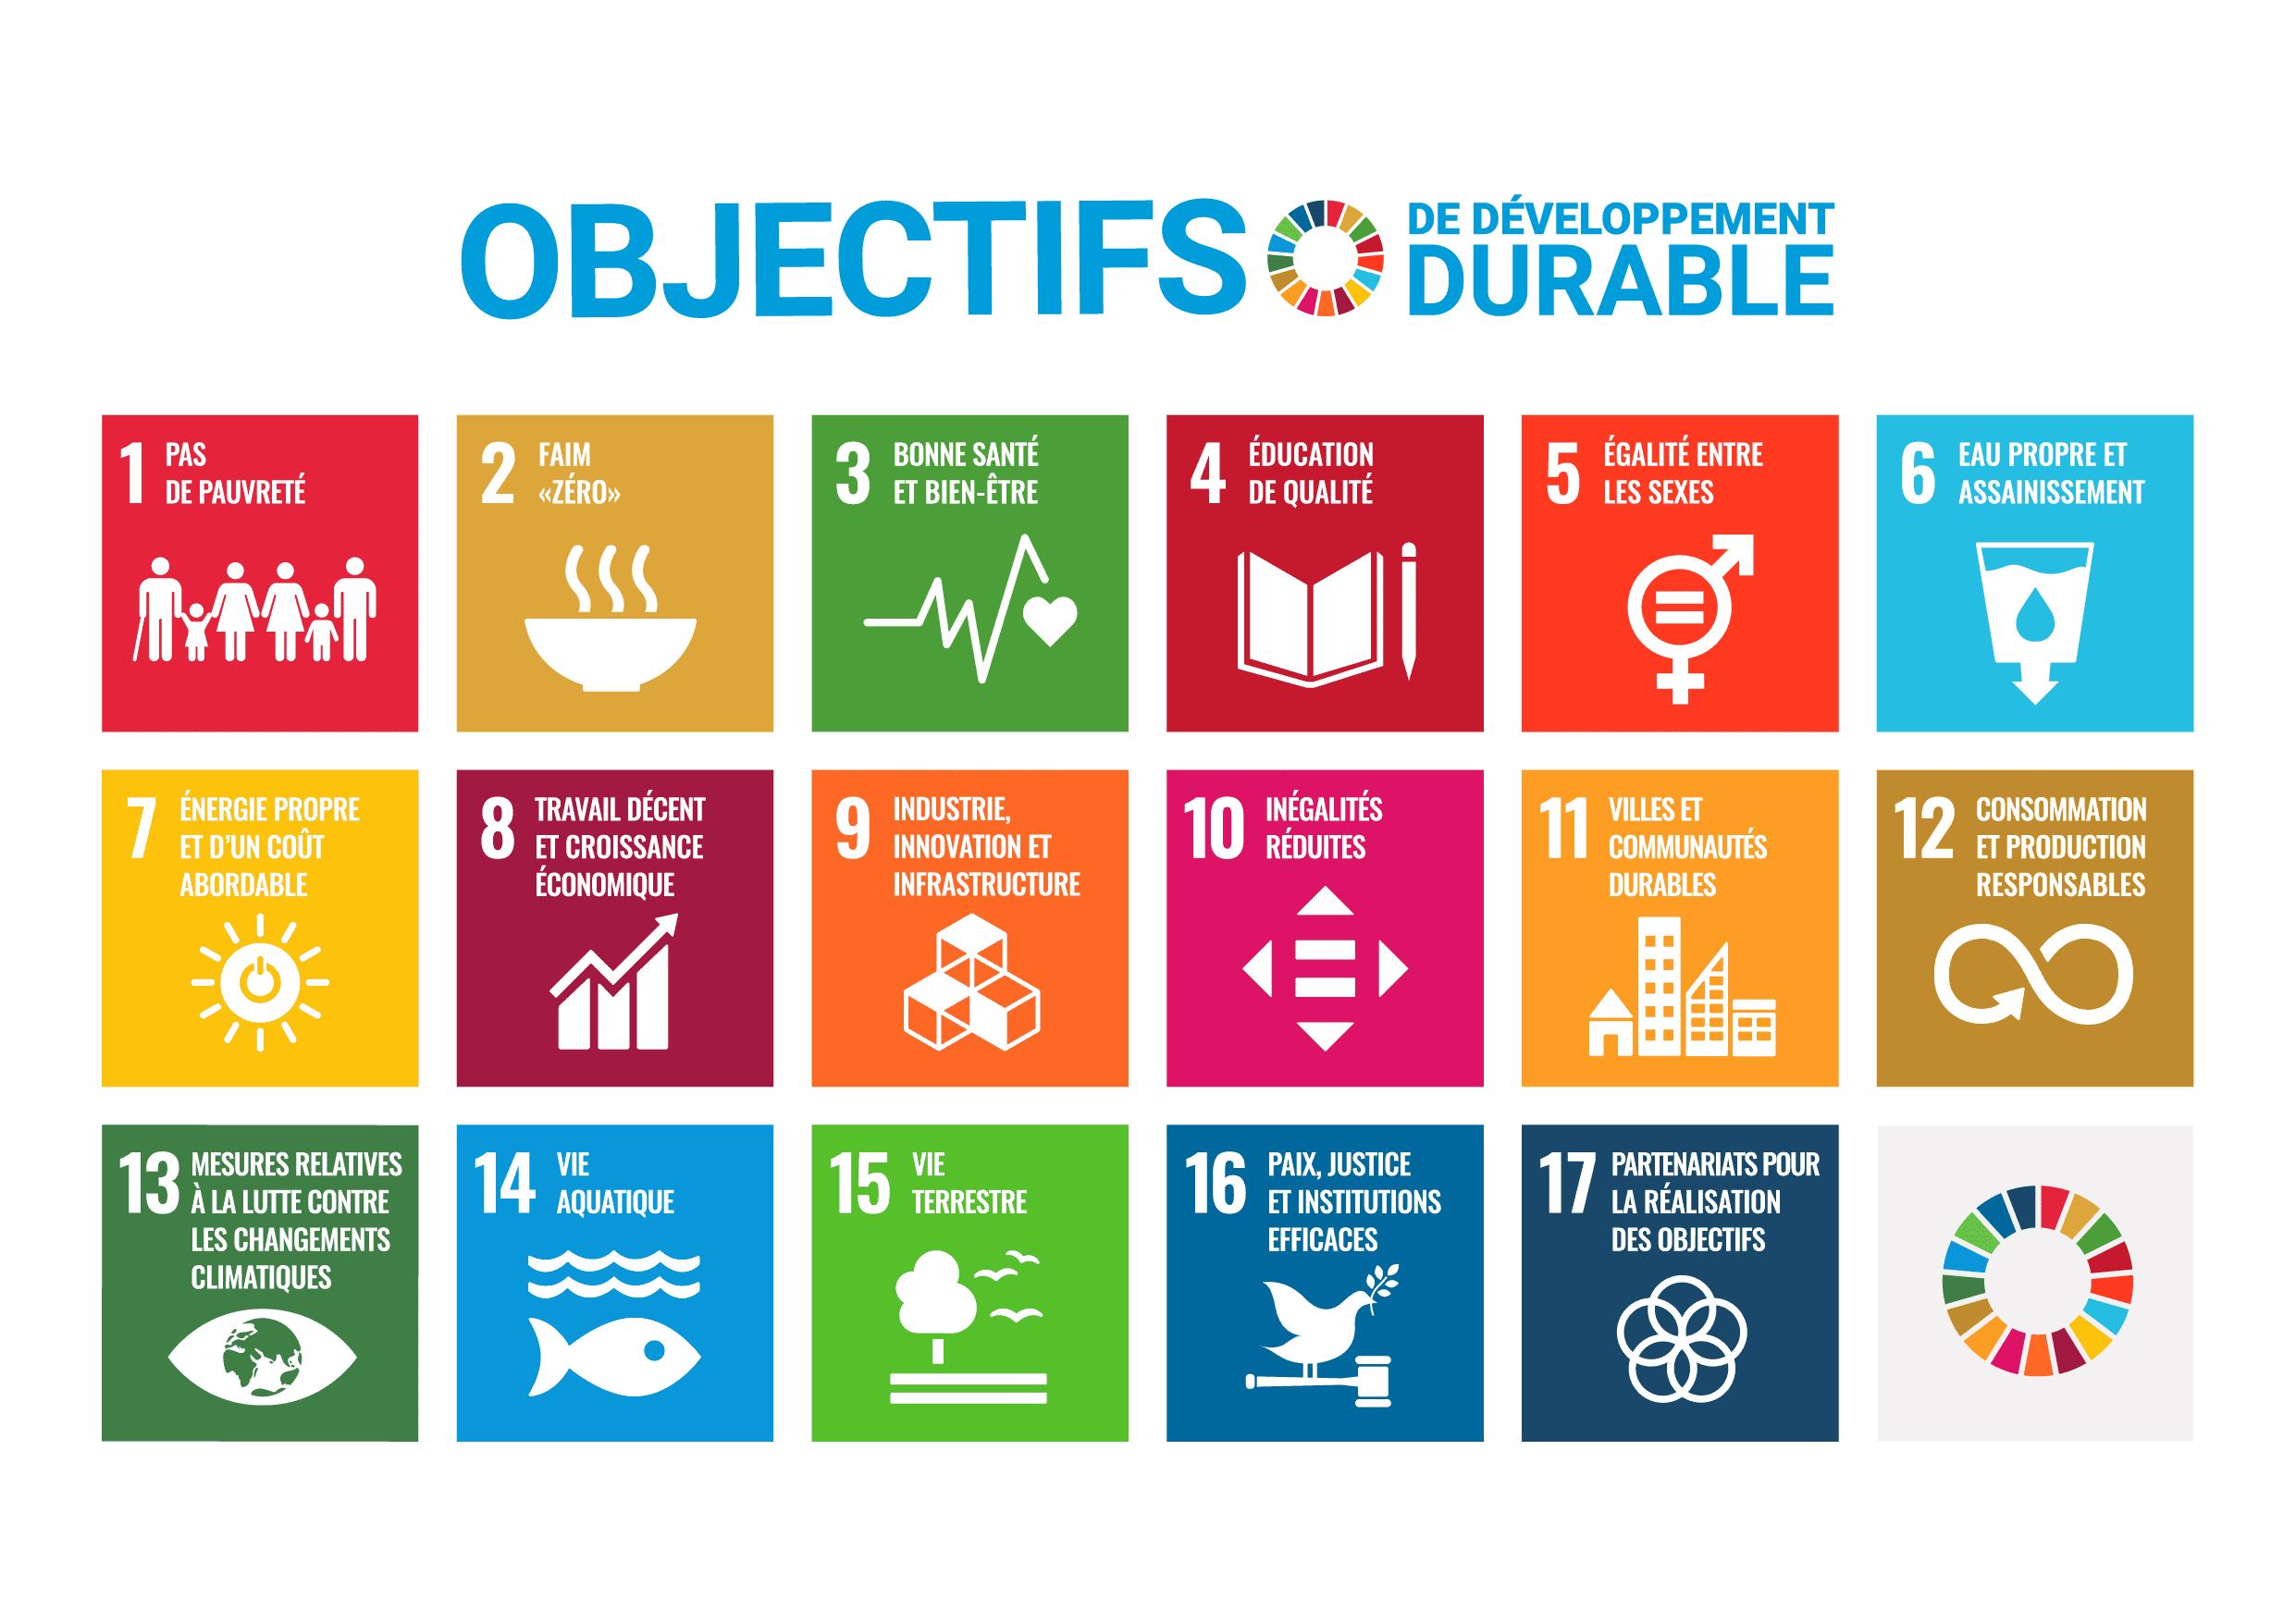 ONU sustainable development objectives